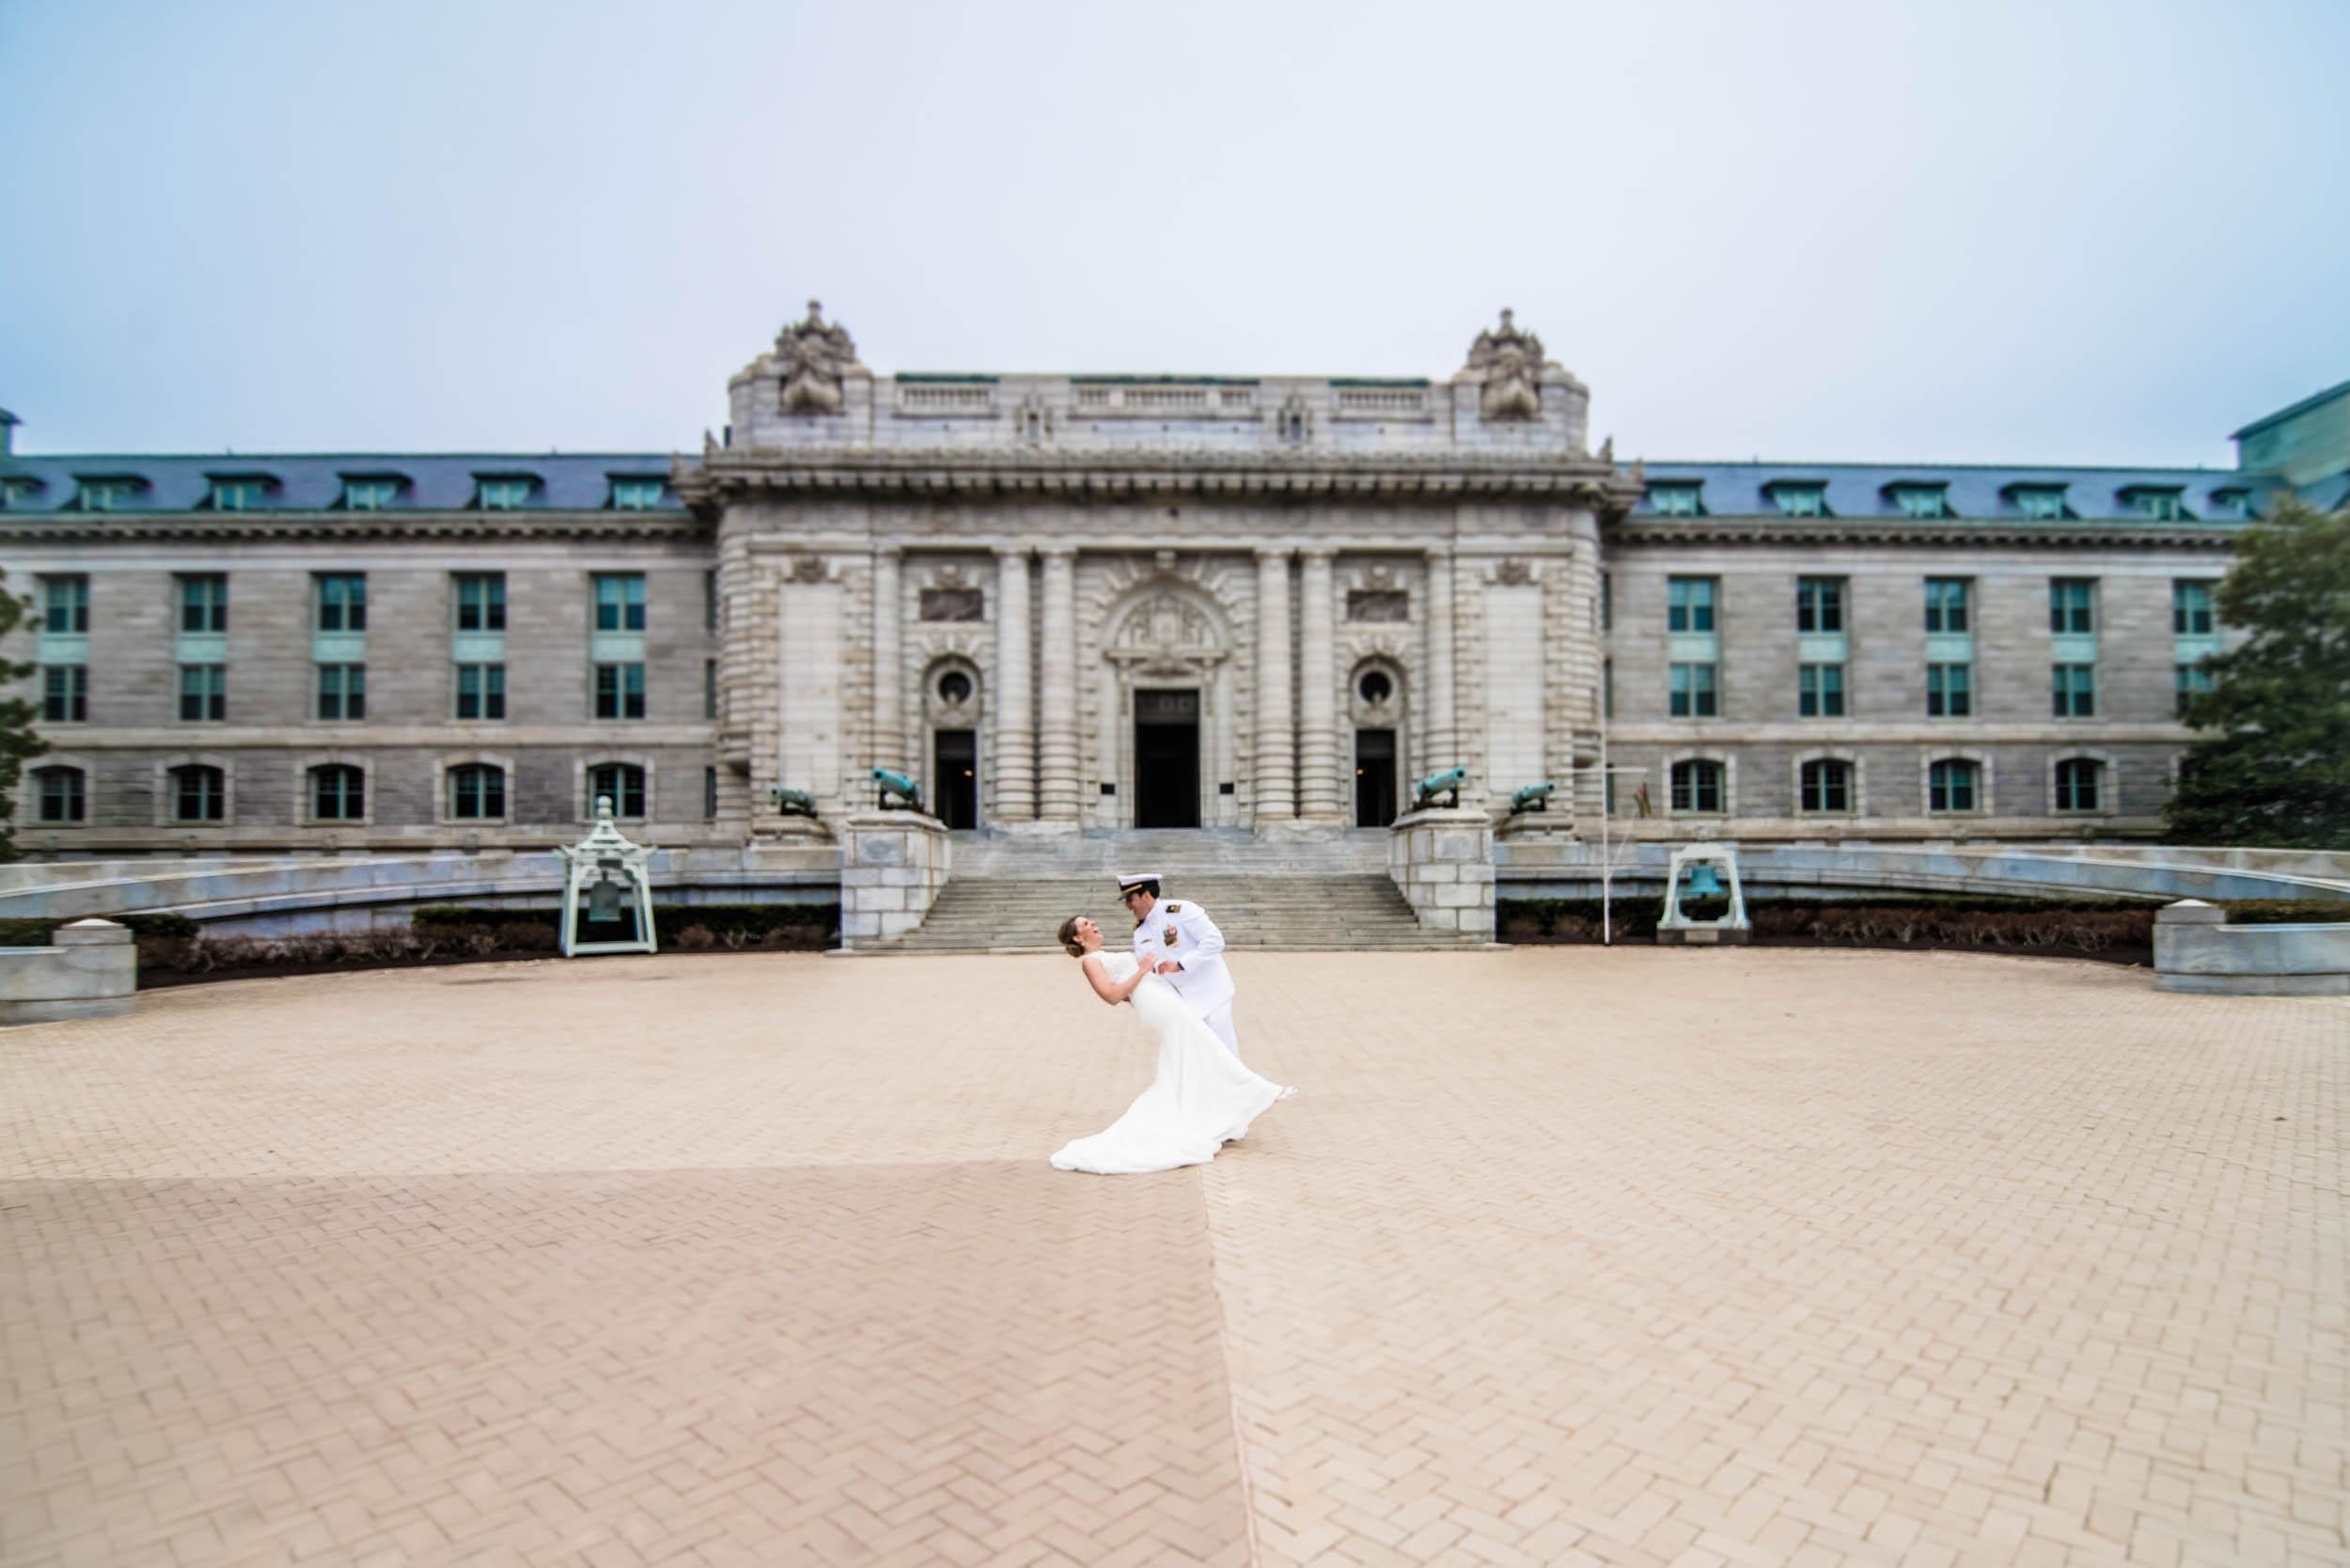 dc+metro+wedding+photographer+vadym+guliuk+photography+wedding+bride+and+groom-2066.jpg